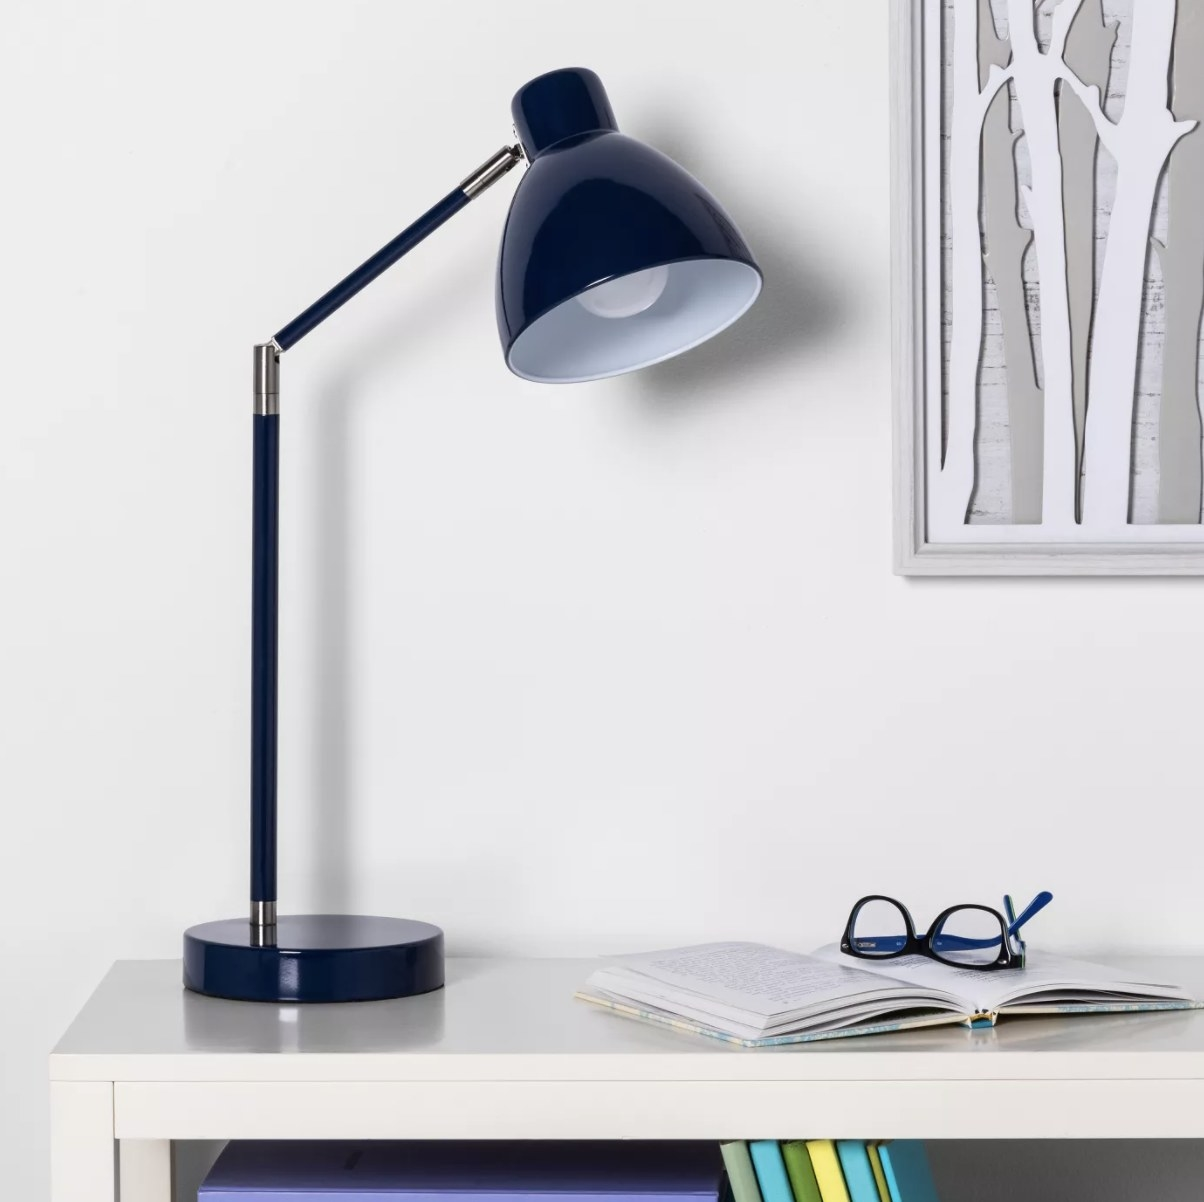 Task table lamp on desk in blue